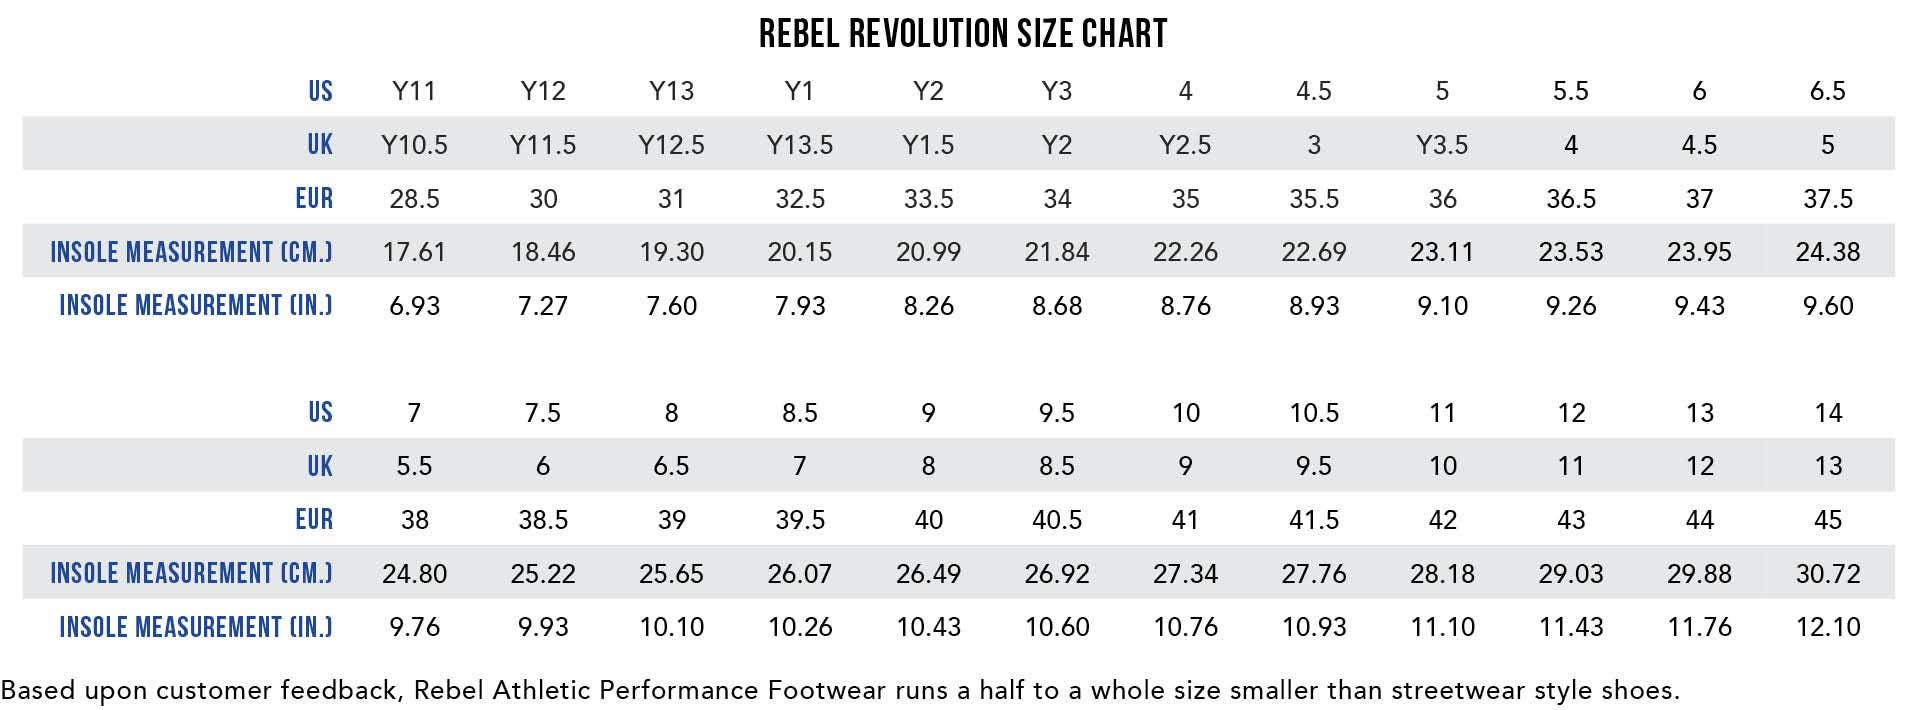 Rebel Revolution Size Chart